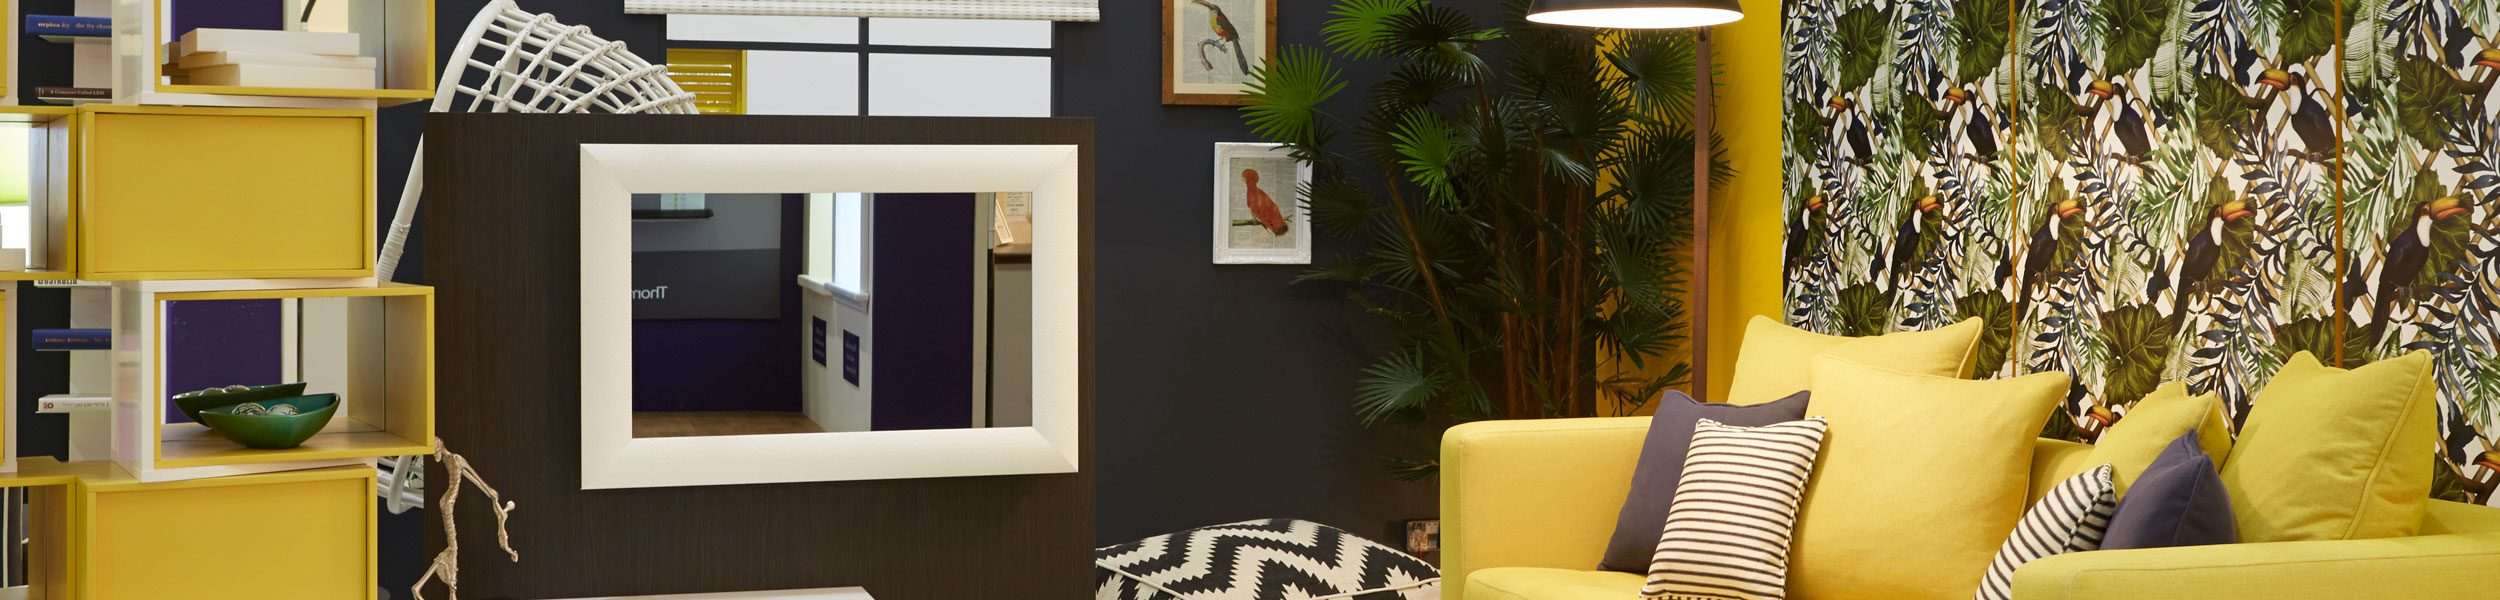 Grand Designs Live - Enaflo Interiors